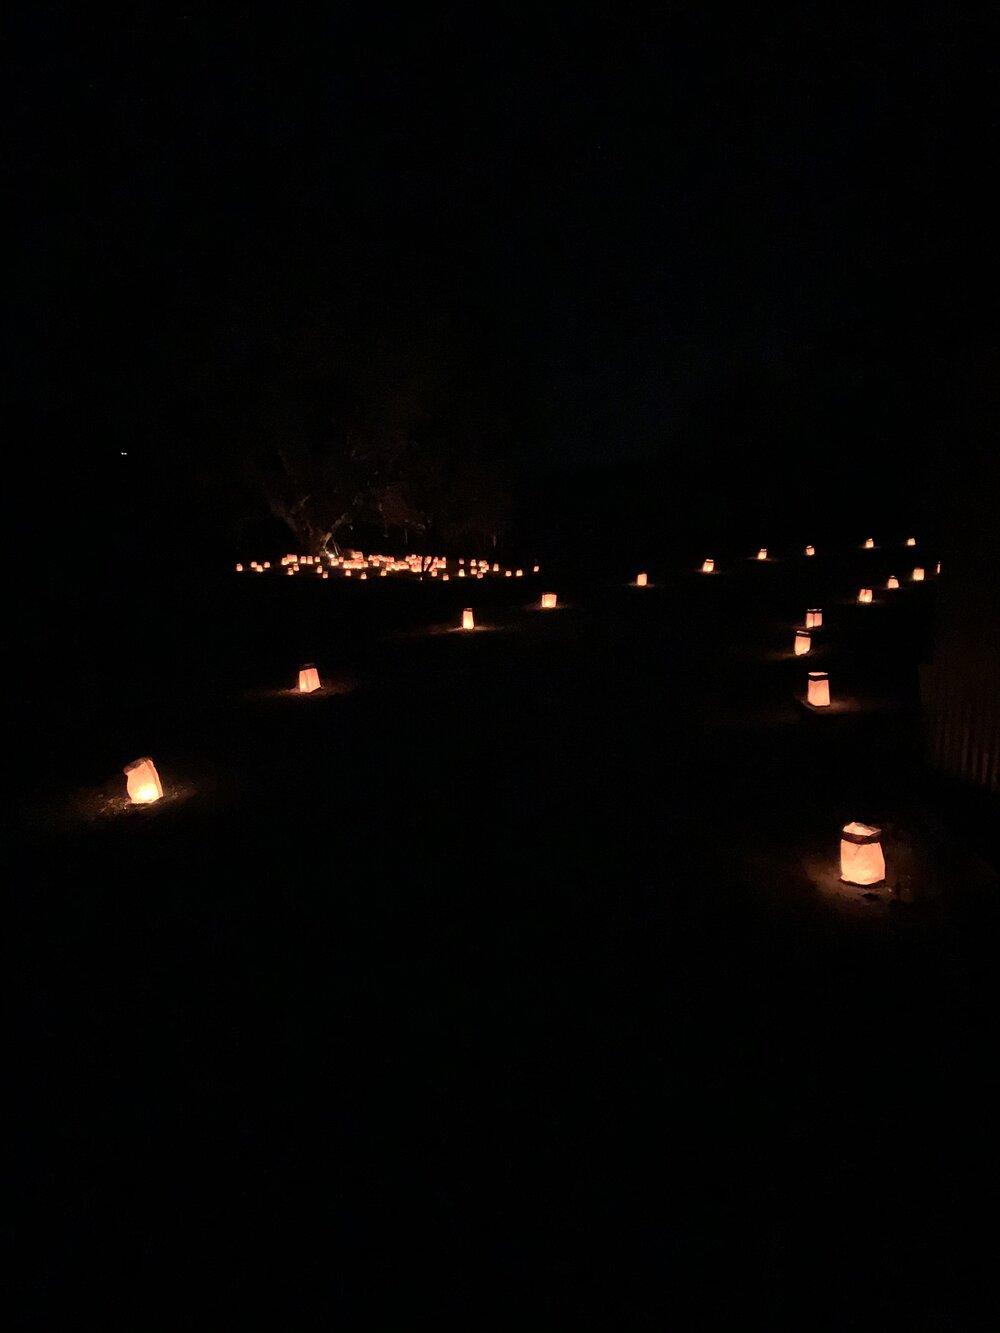 Lanterns leading into 2020...